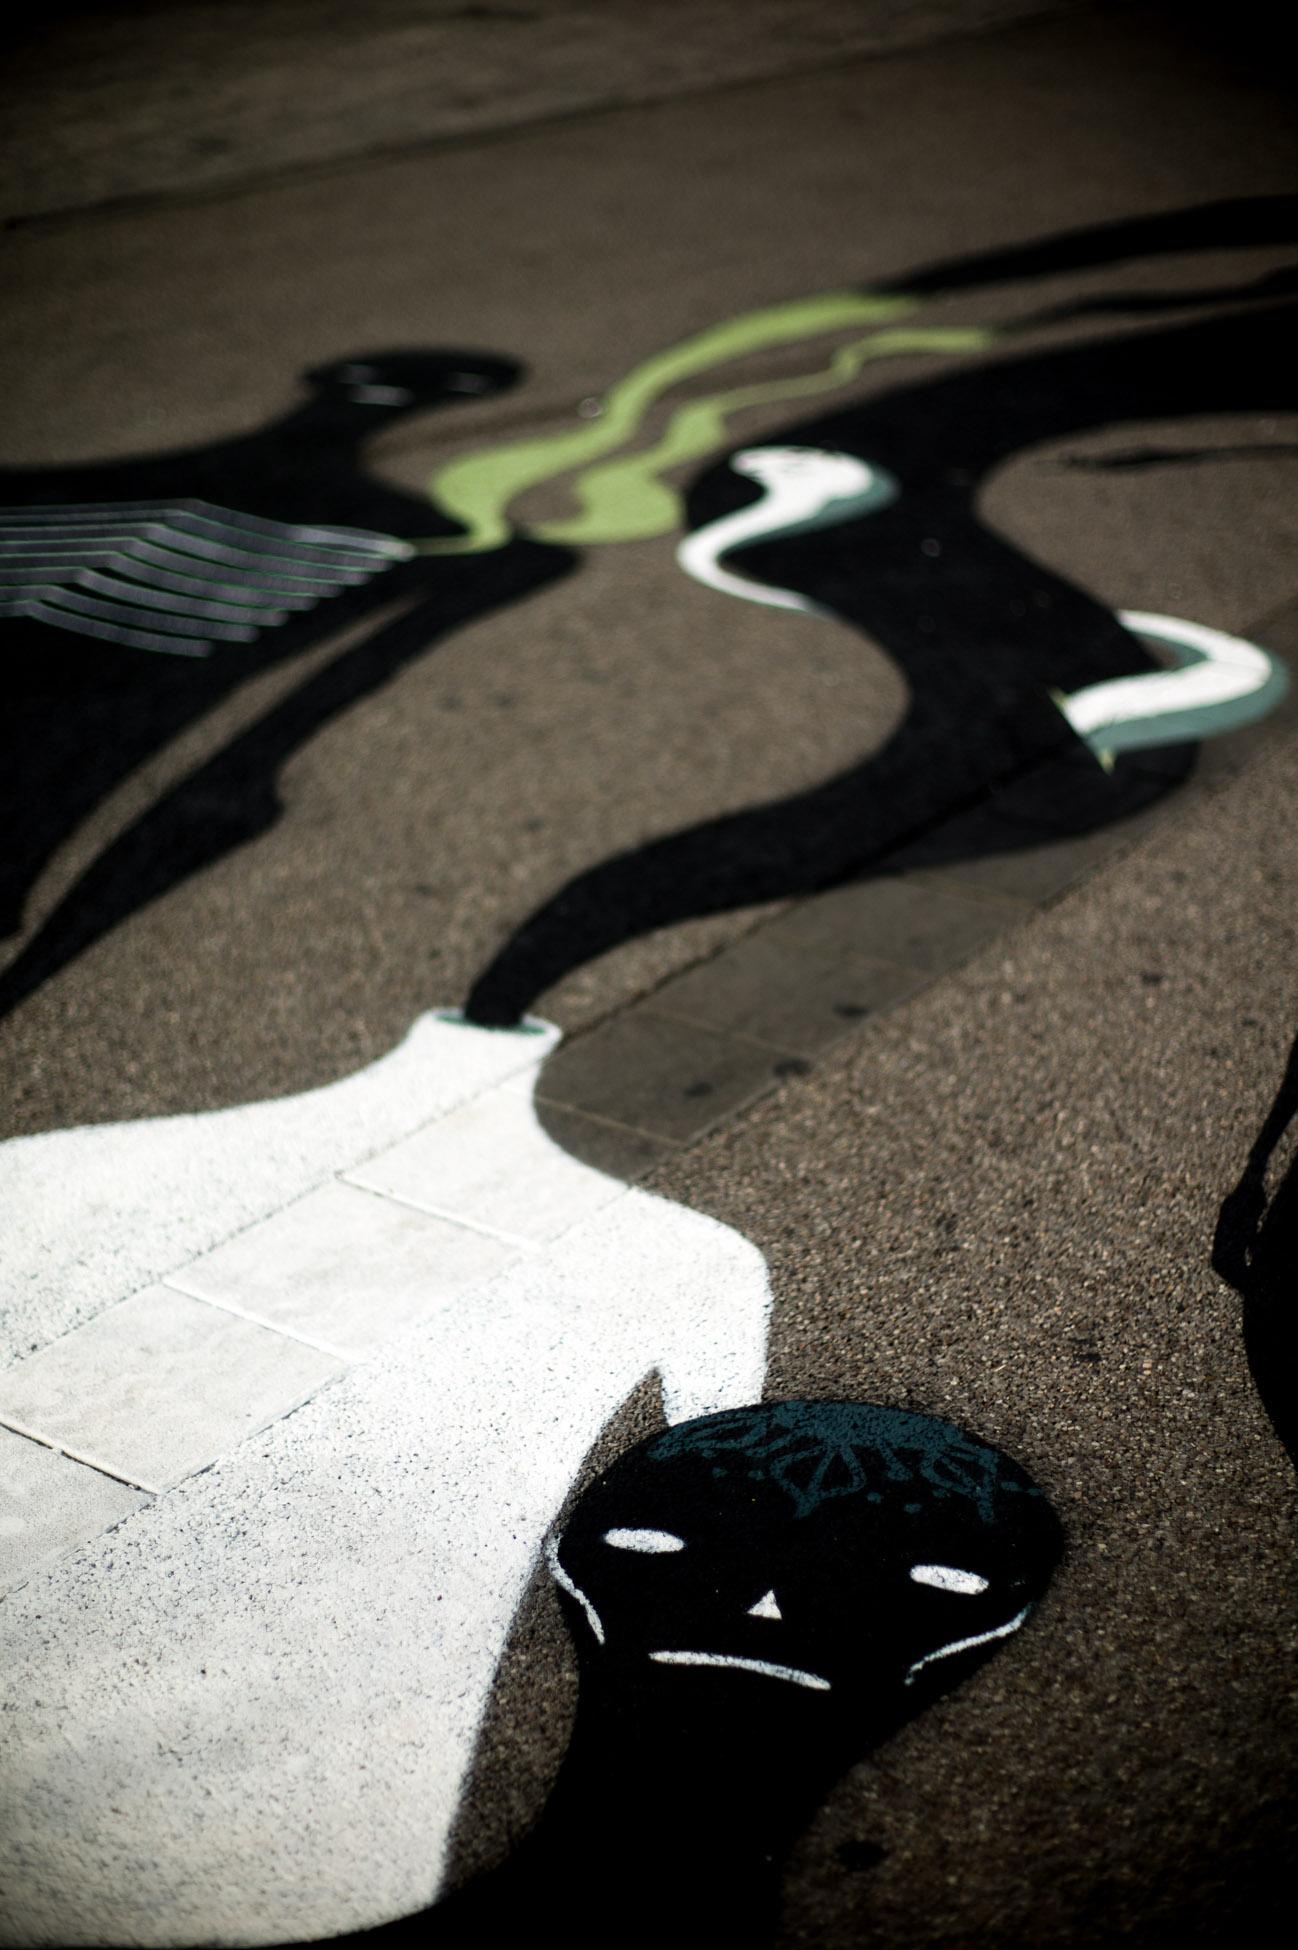 Streetart_Brazil_Herbert_Baglione_2013_Frankfurt (19 von 20)